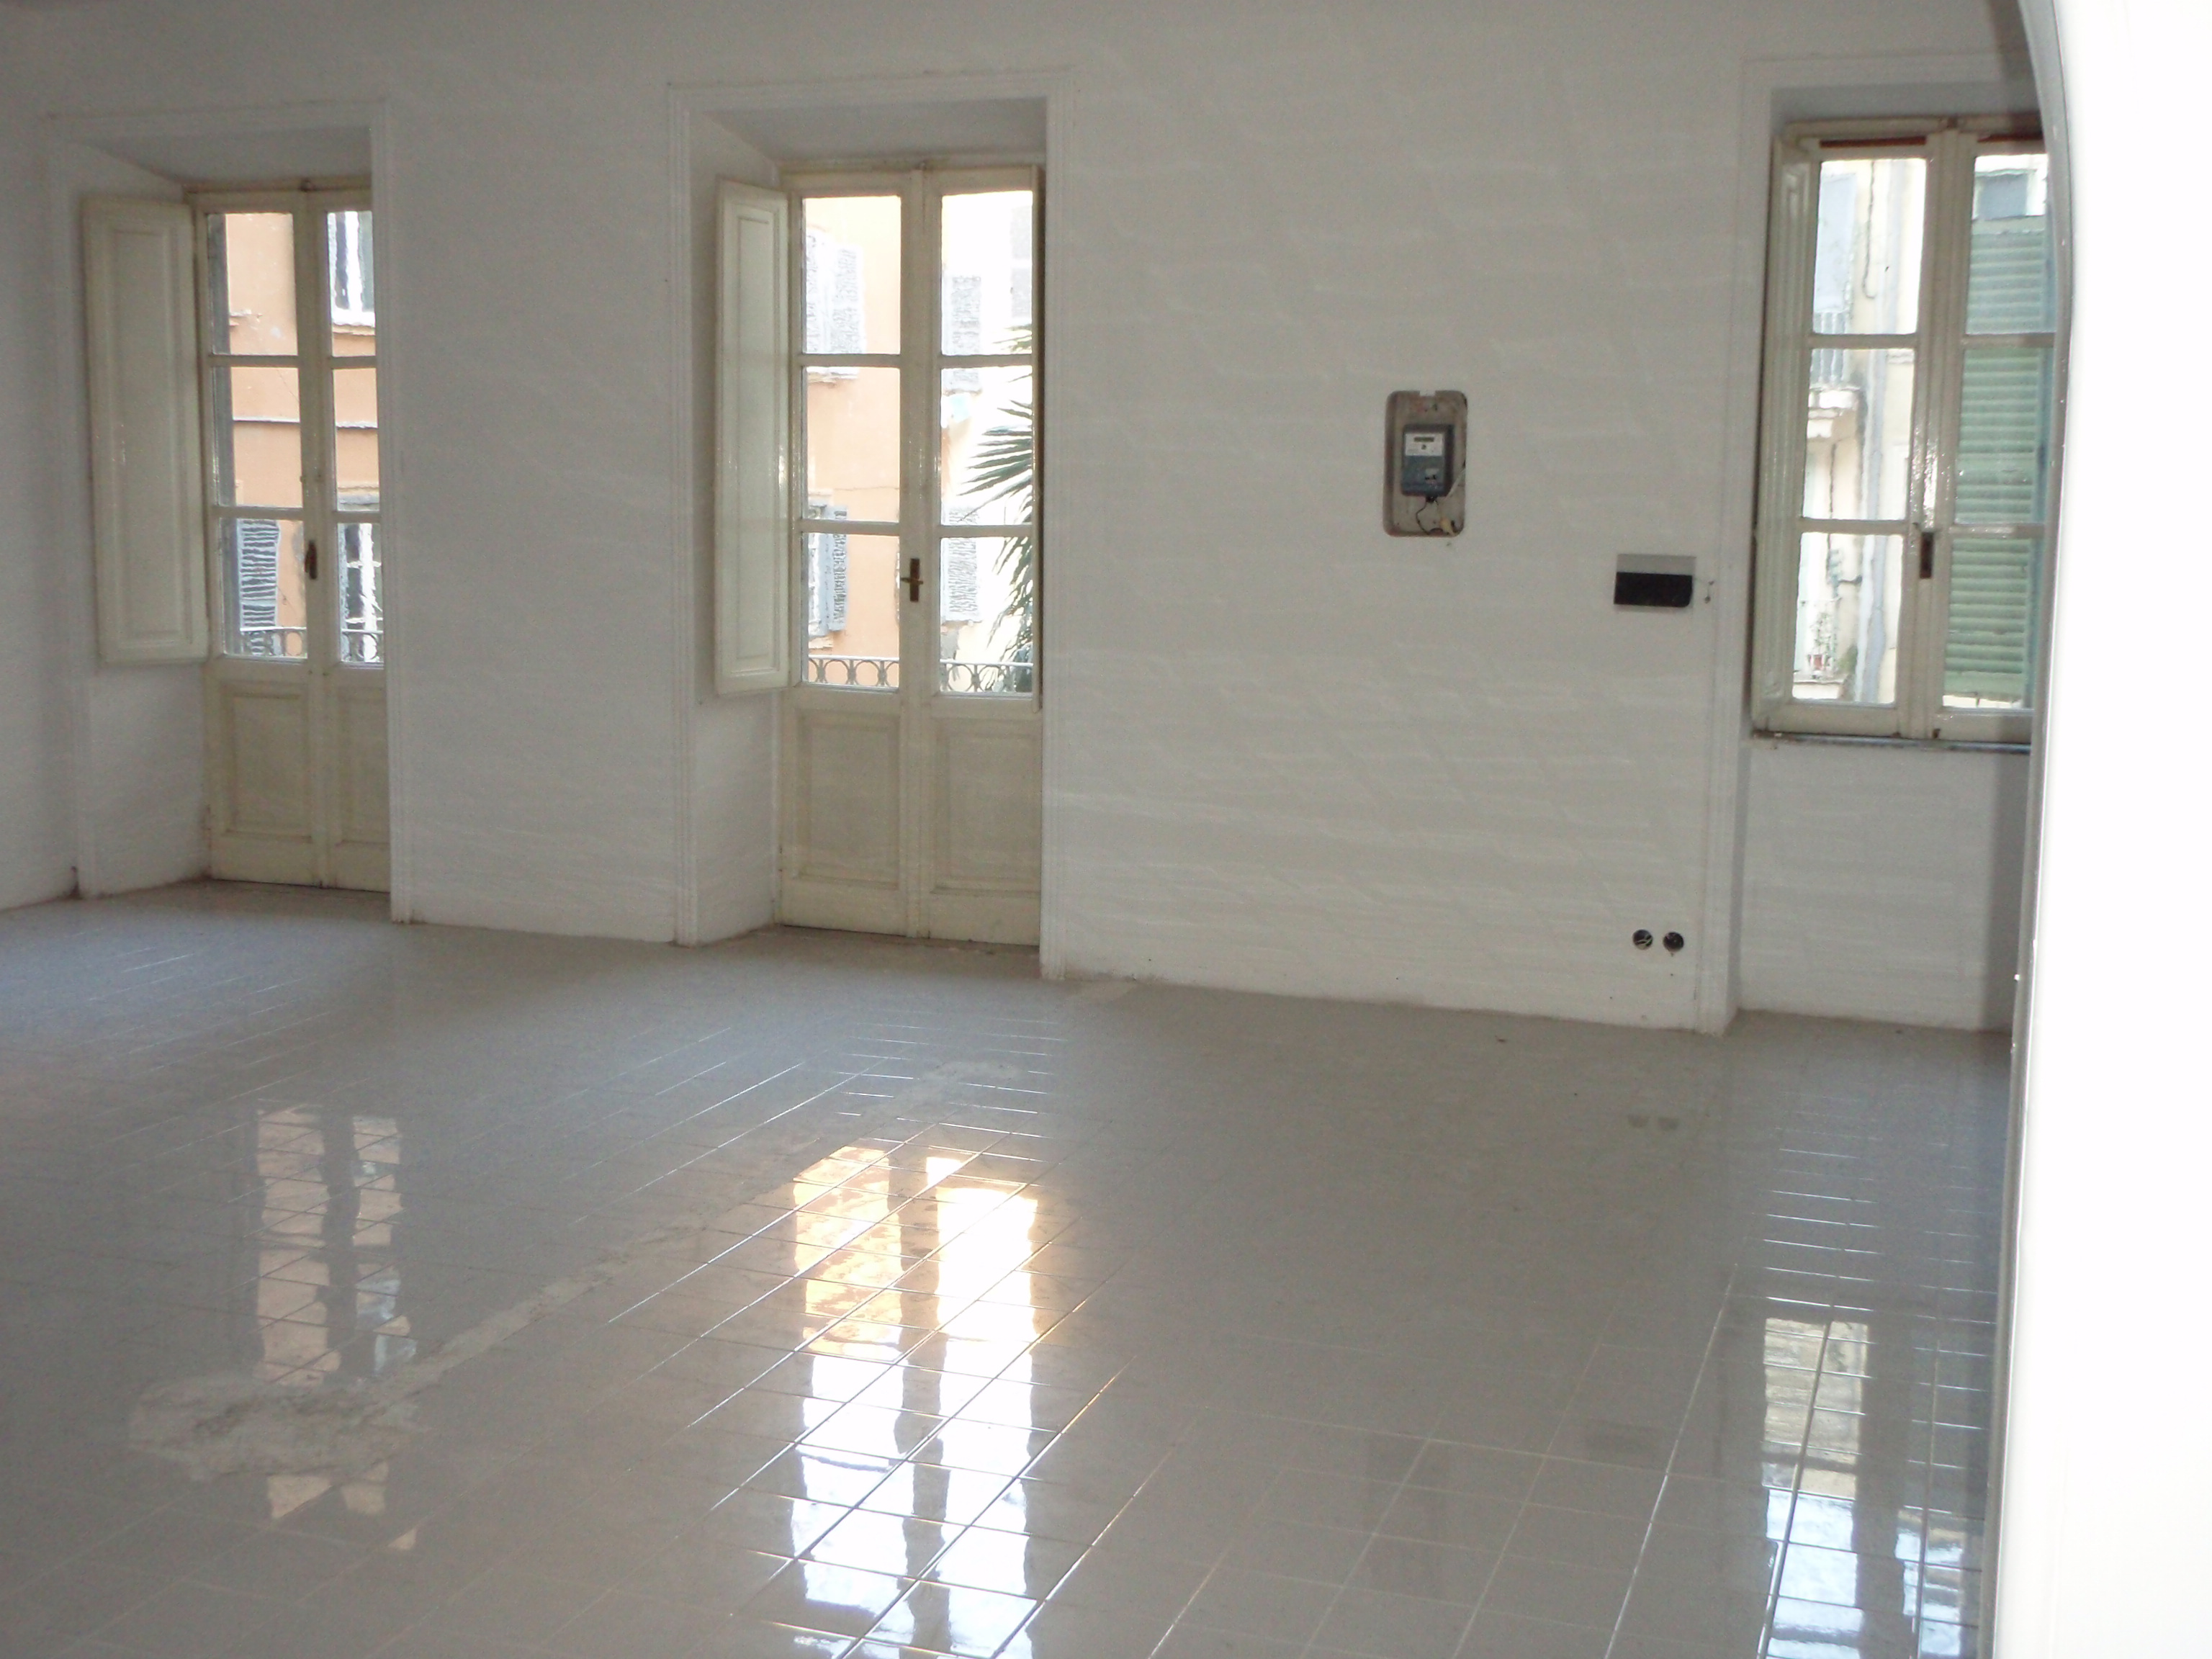 Venta Más de 5 Habitaciones, Roma, Roma, Italia, via bergamo 43  italia.real...